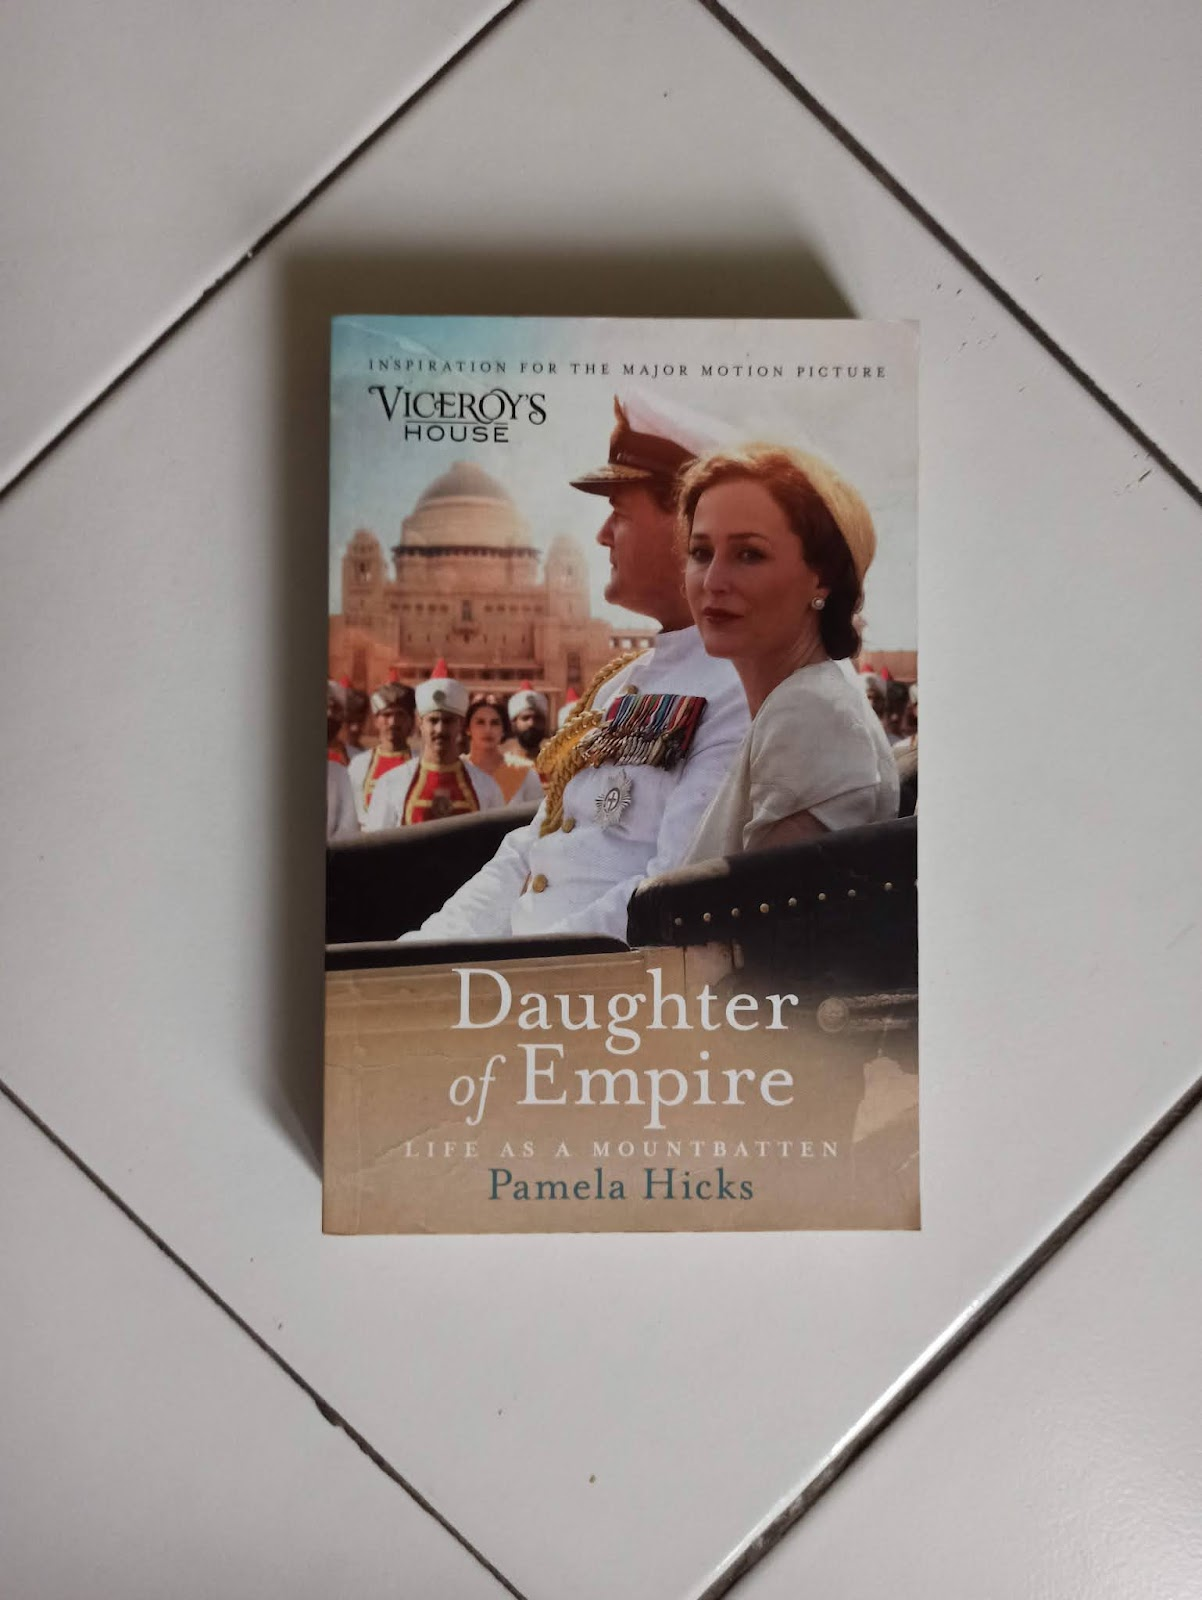 Daughter of Empire by Pamela HIcks